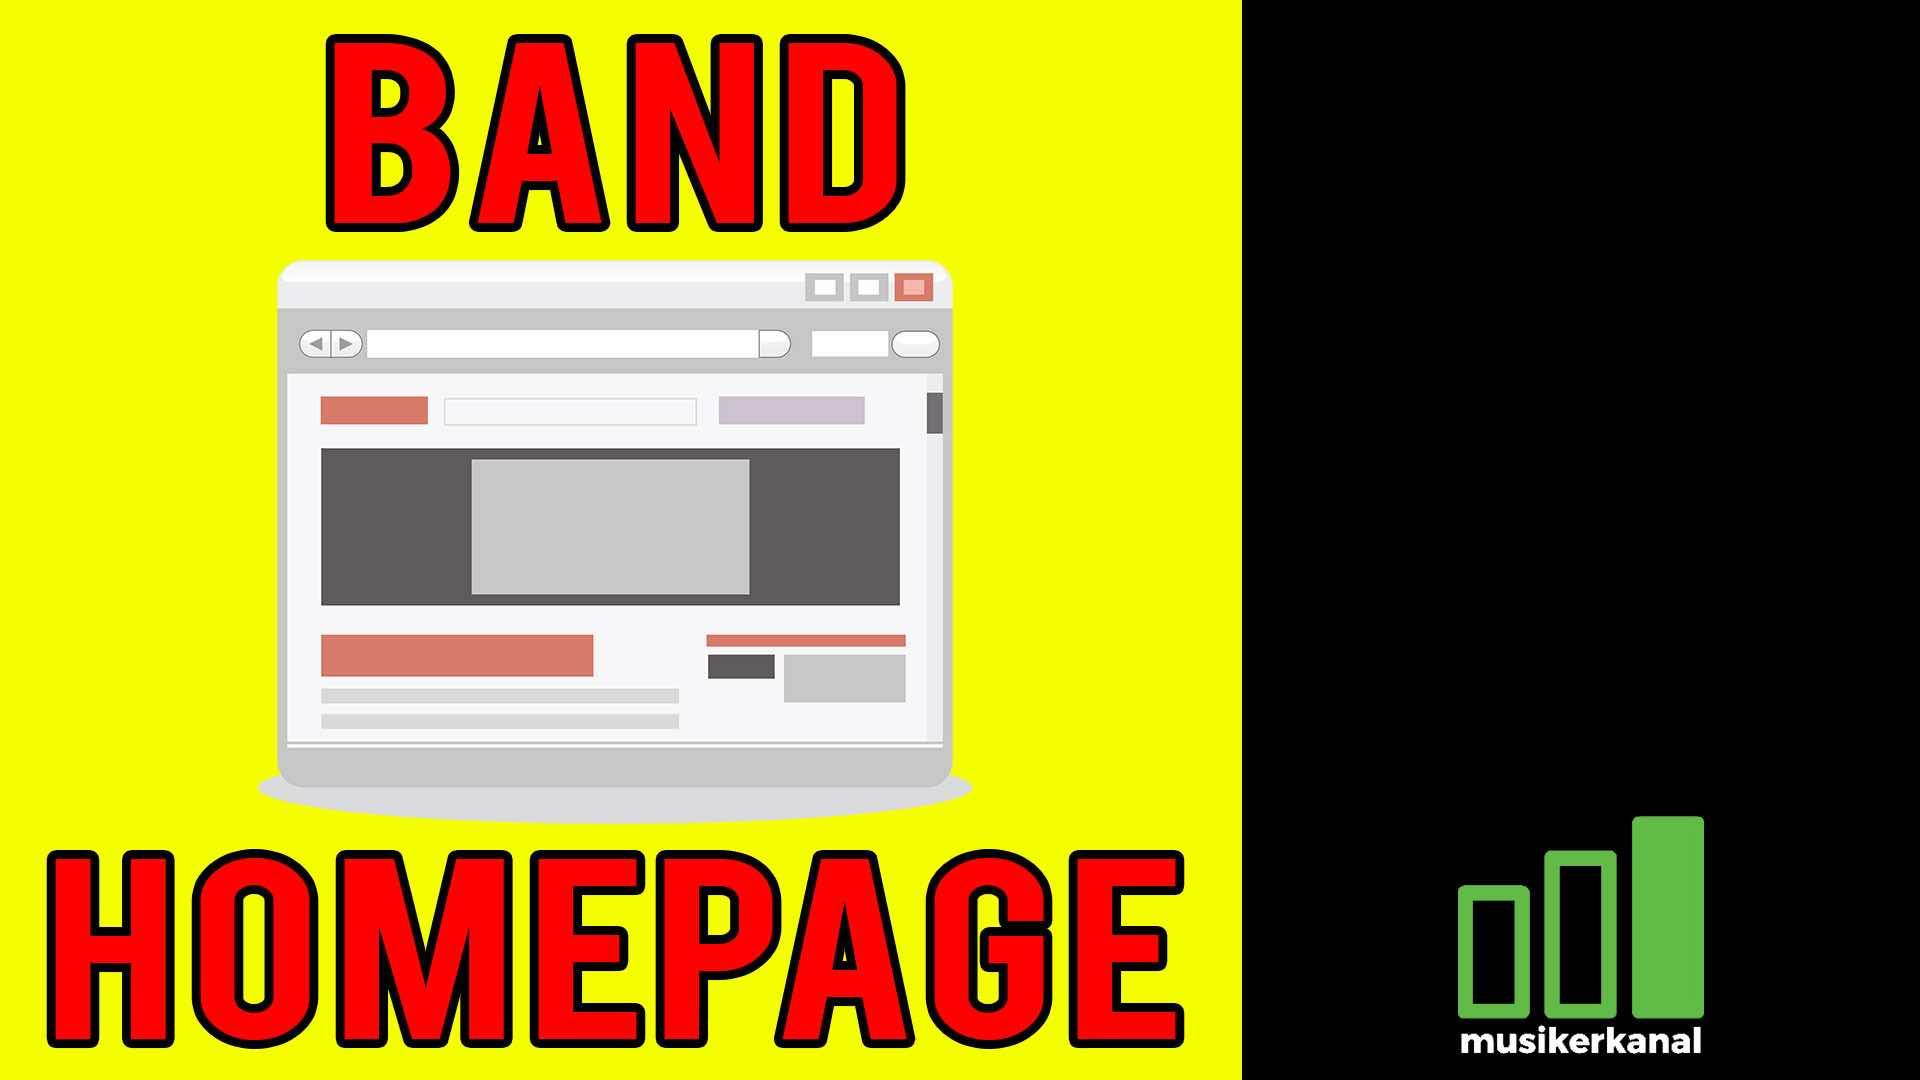 Band homepage